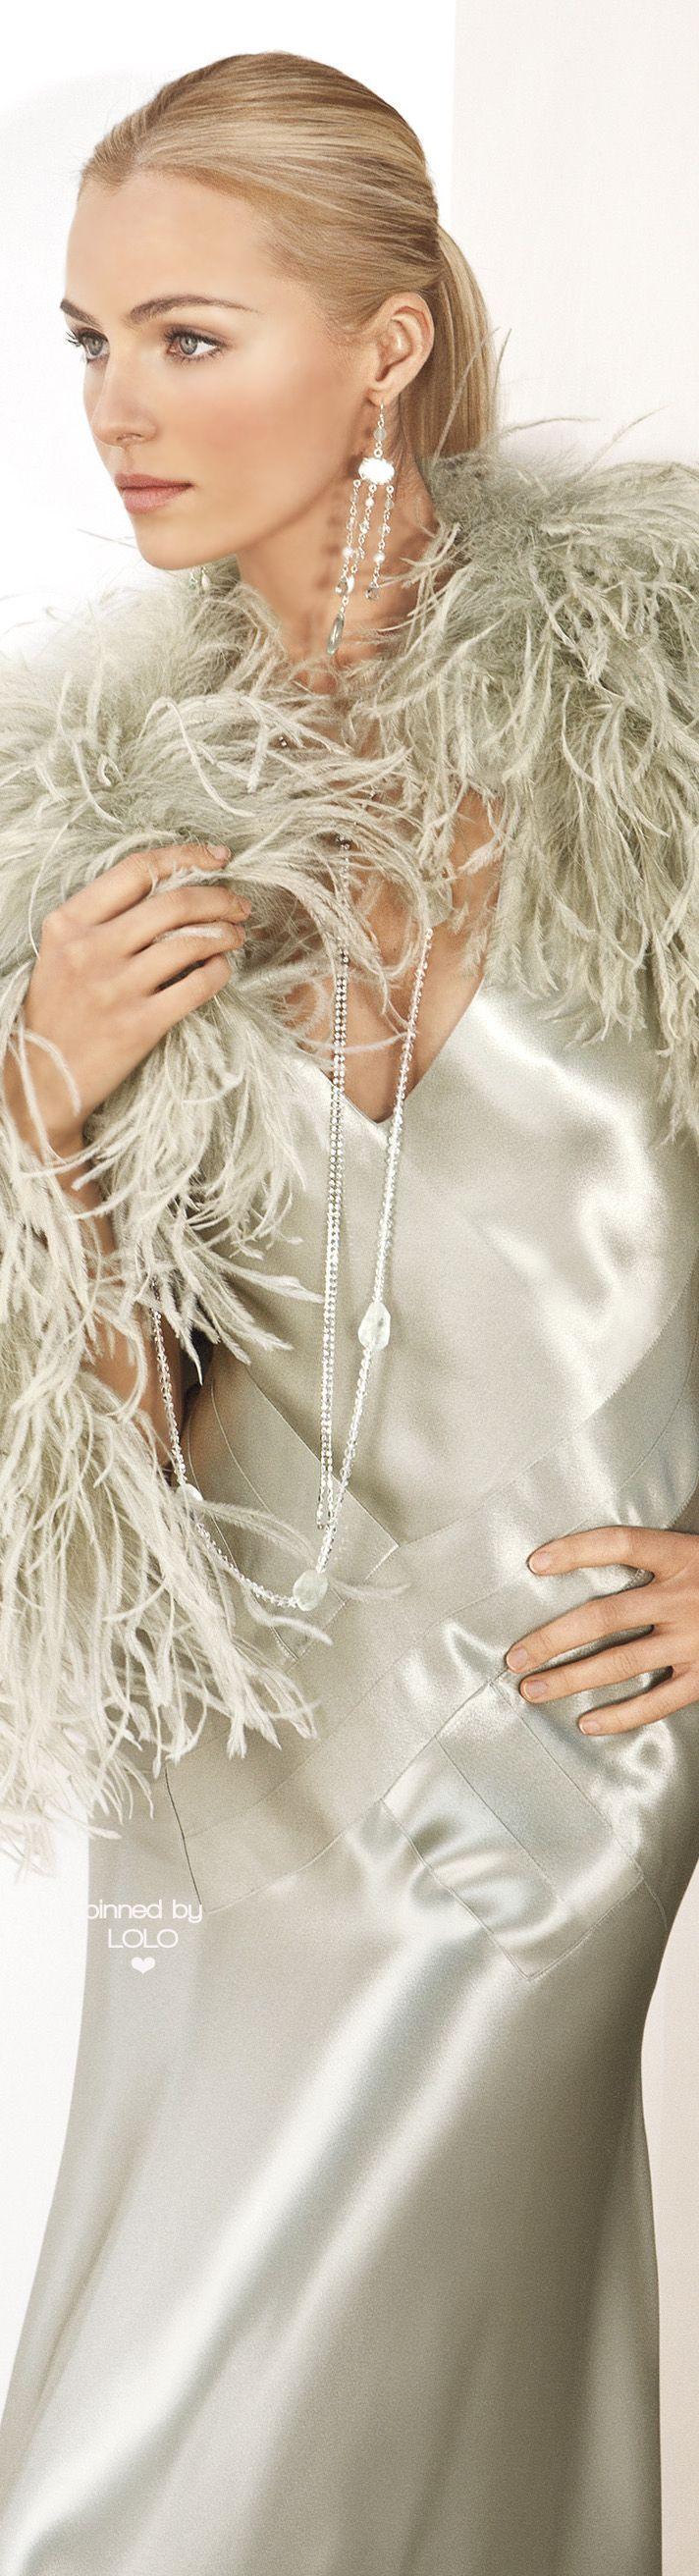 Valentina Zelyaeva for Ralph Lauren | LOLO❤: